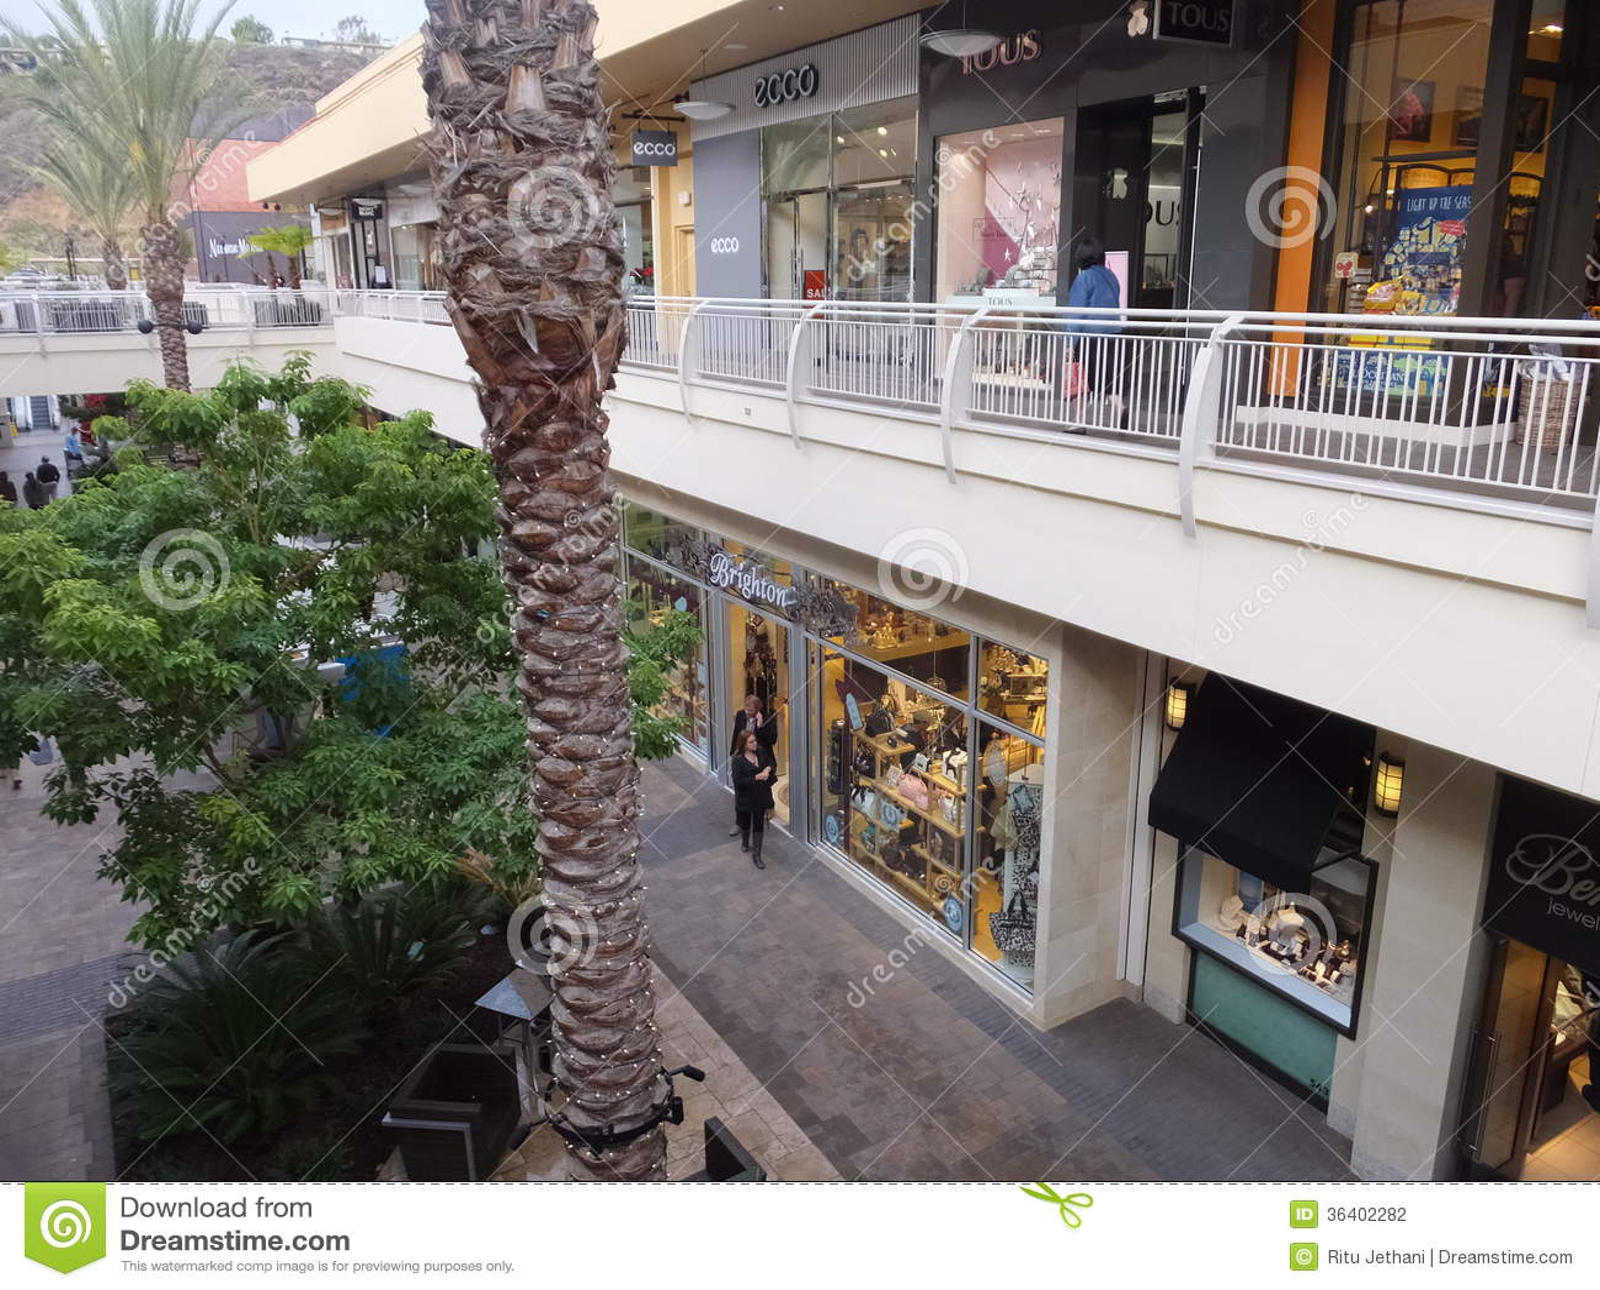 Fashion Valley Mall in San Diego, California